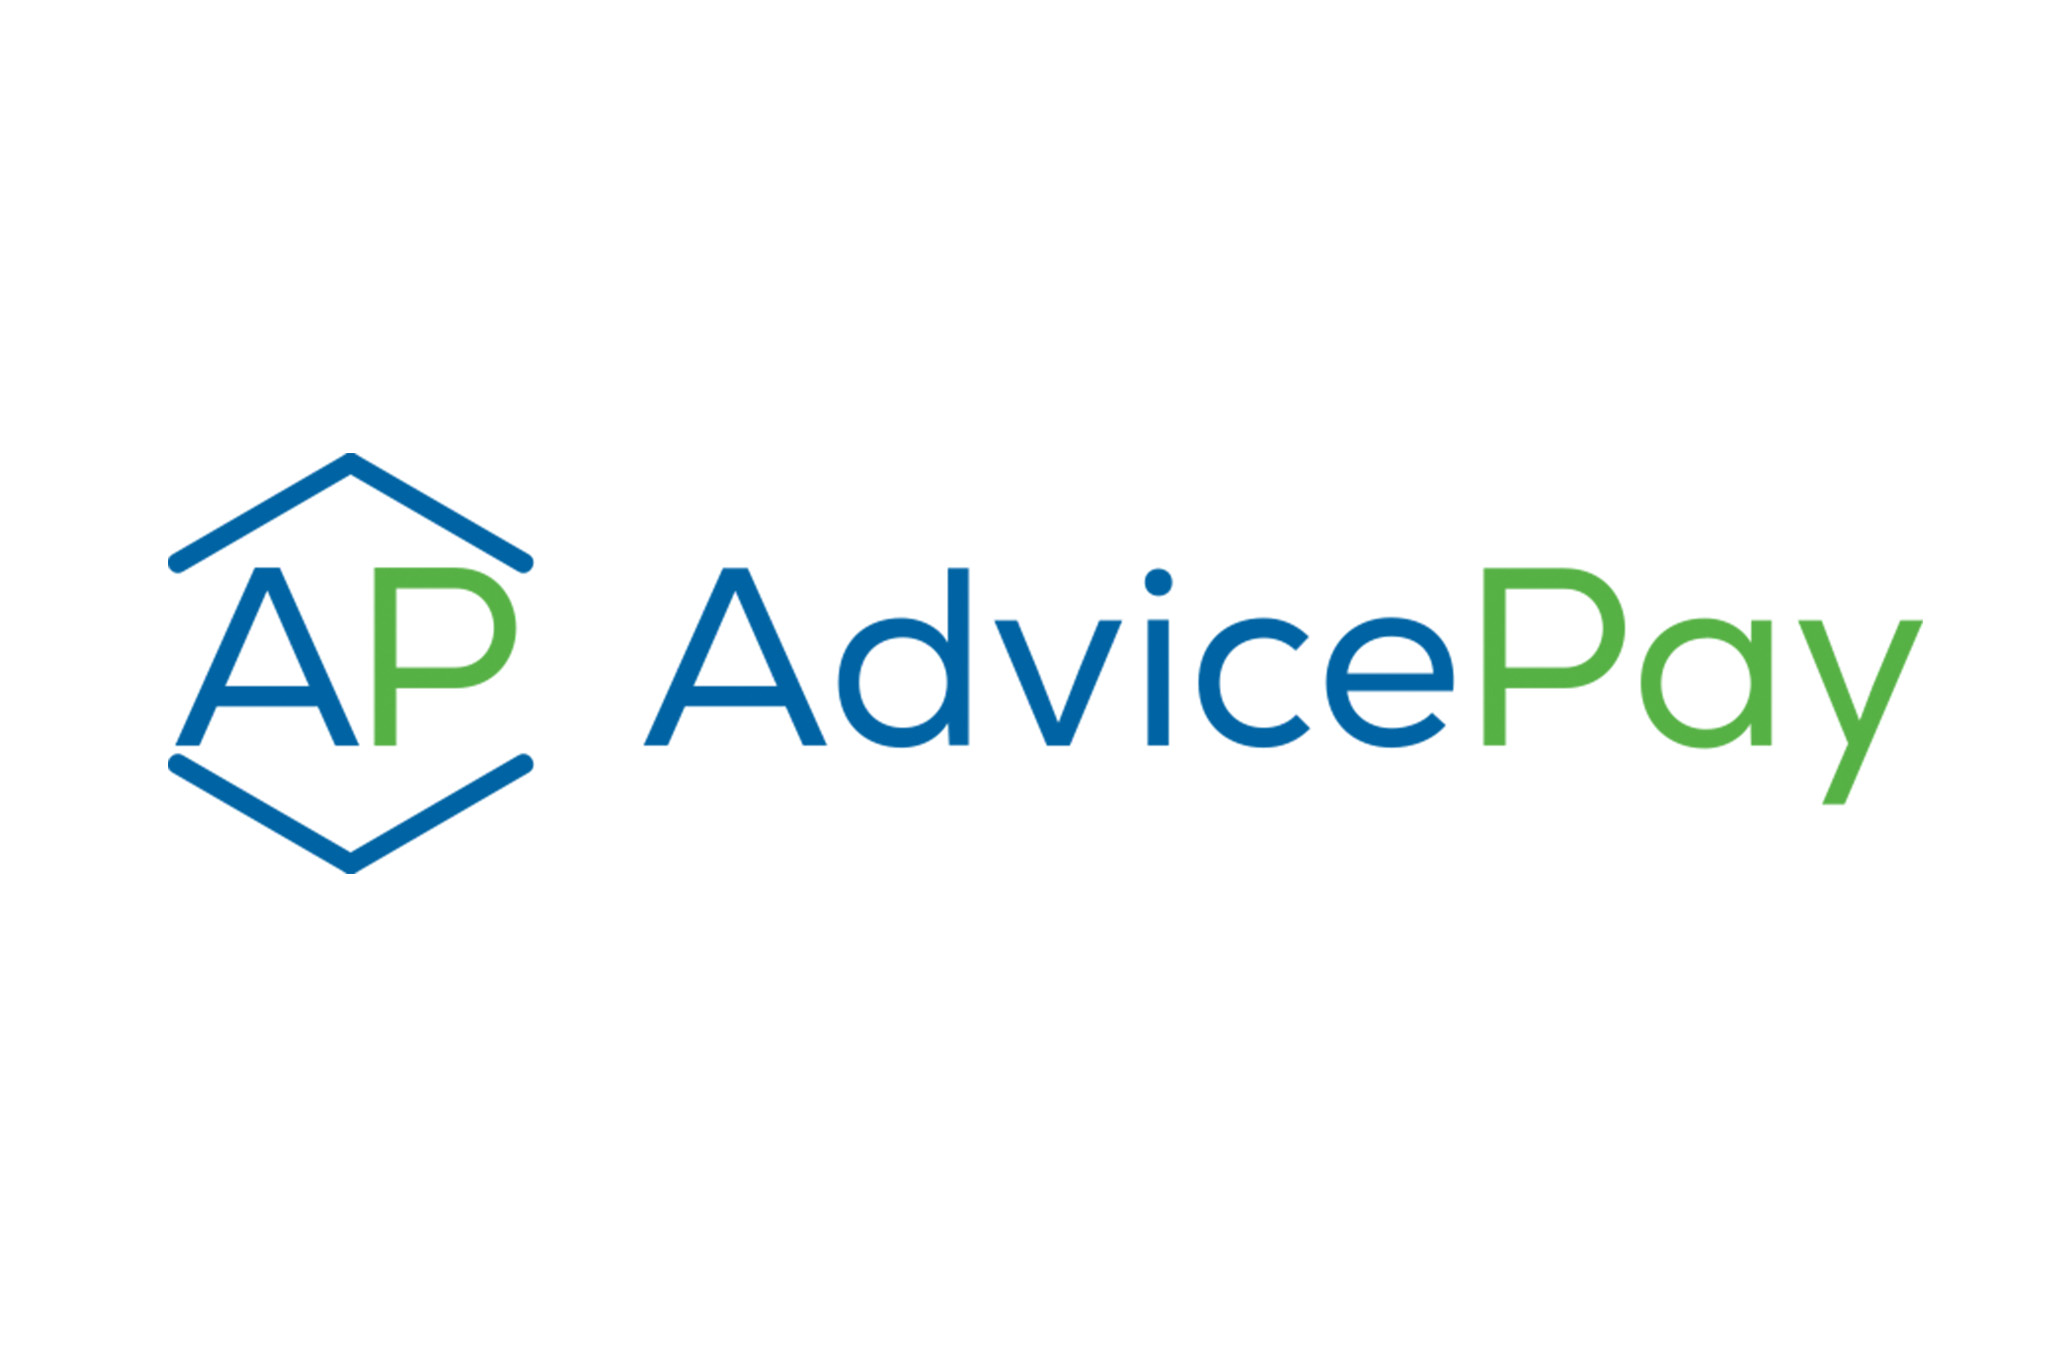 https://www.financialstaples.com/wp-content/uploads/2020/08/Financial-Staples-AdvicePay.jpg